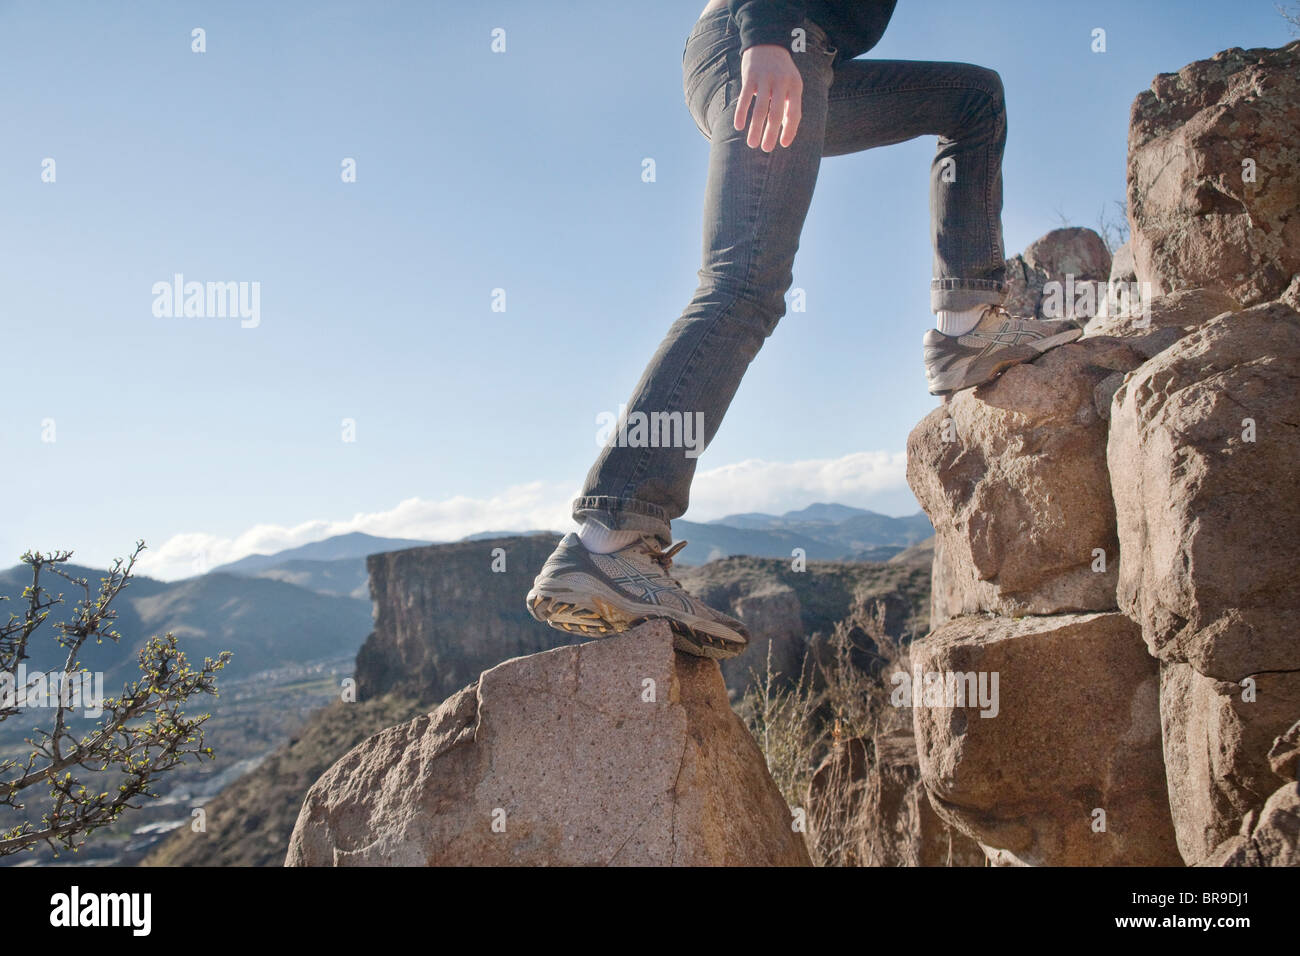 Mulher sobe rochas Imagens de Stock